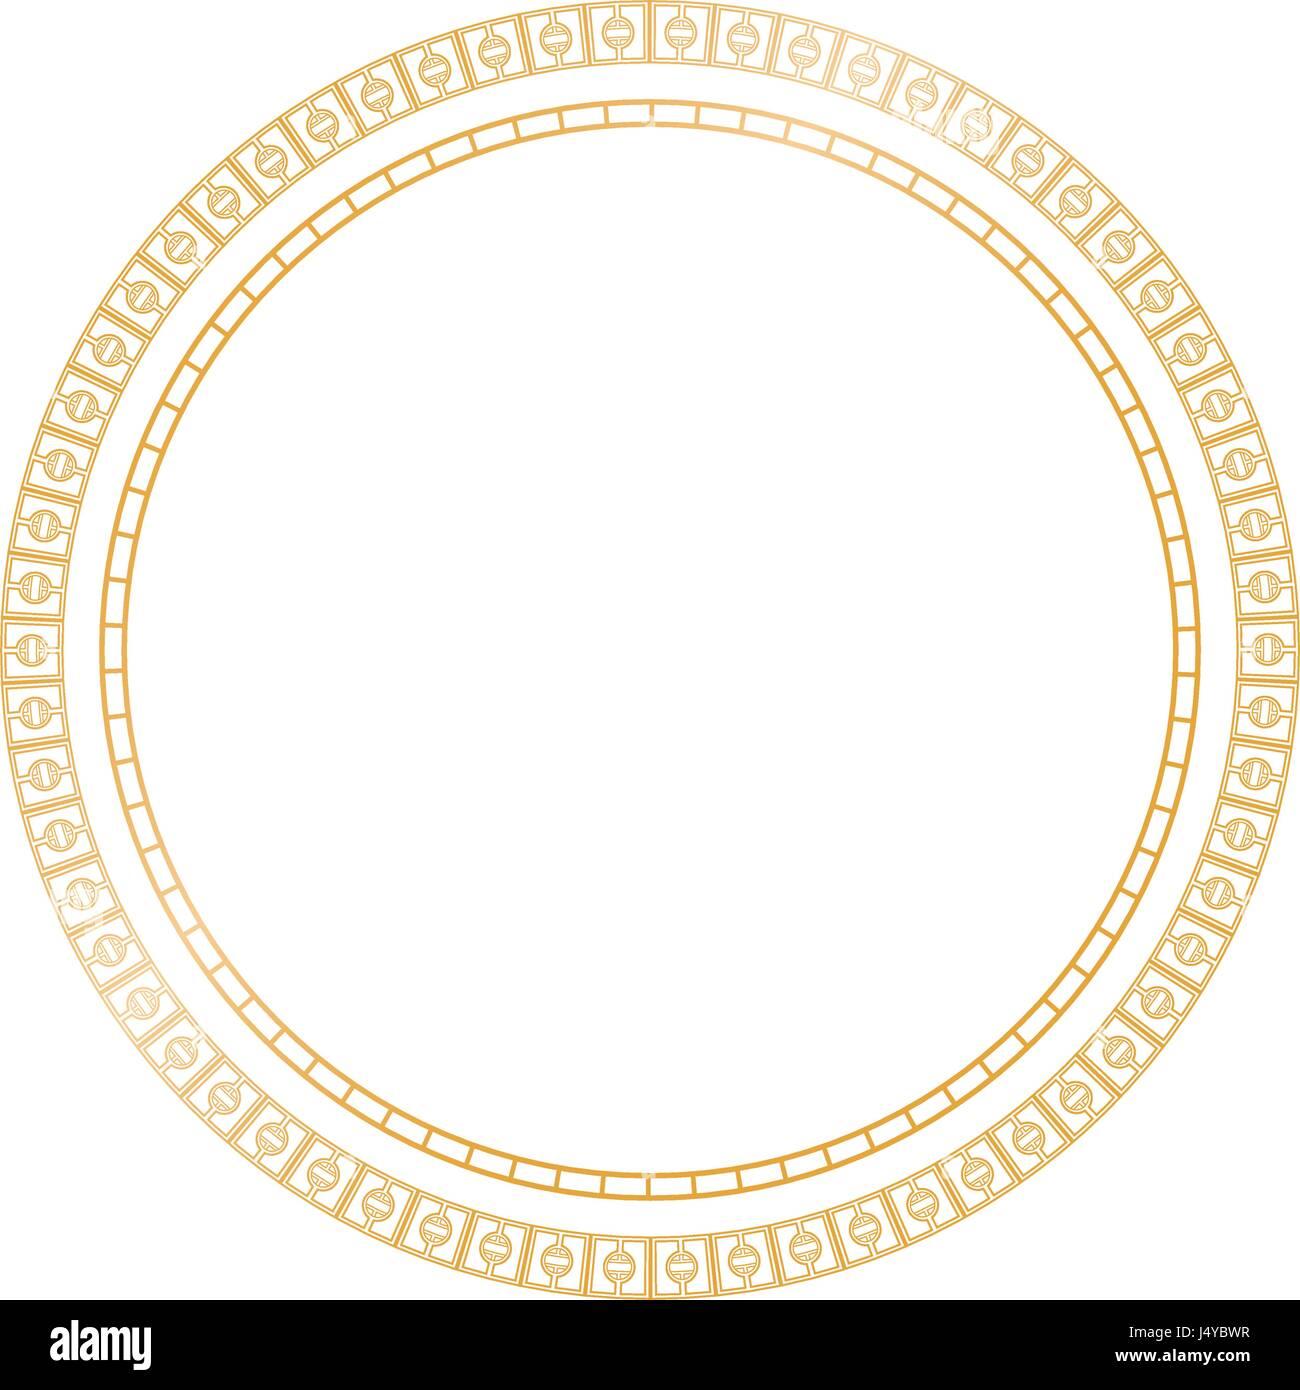 Golden Shiny Circle Frame on Transparent Background, Vector Stock ...